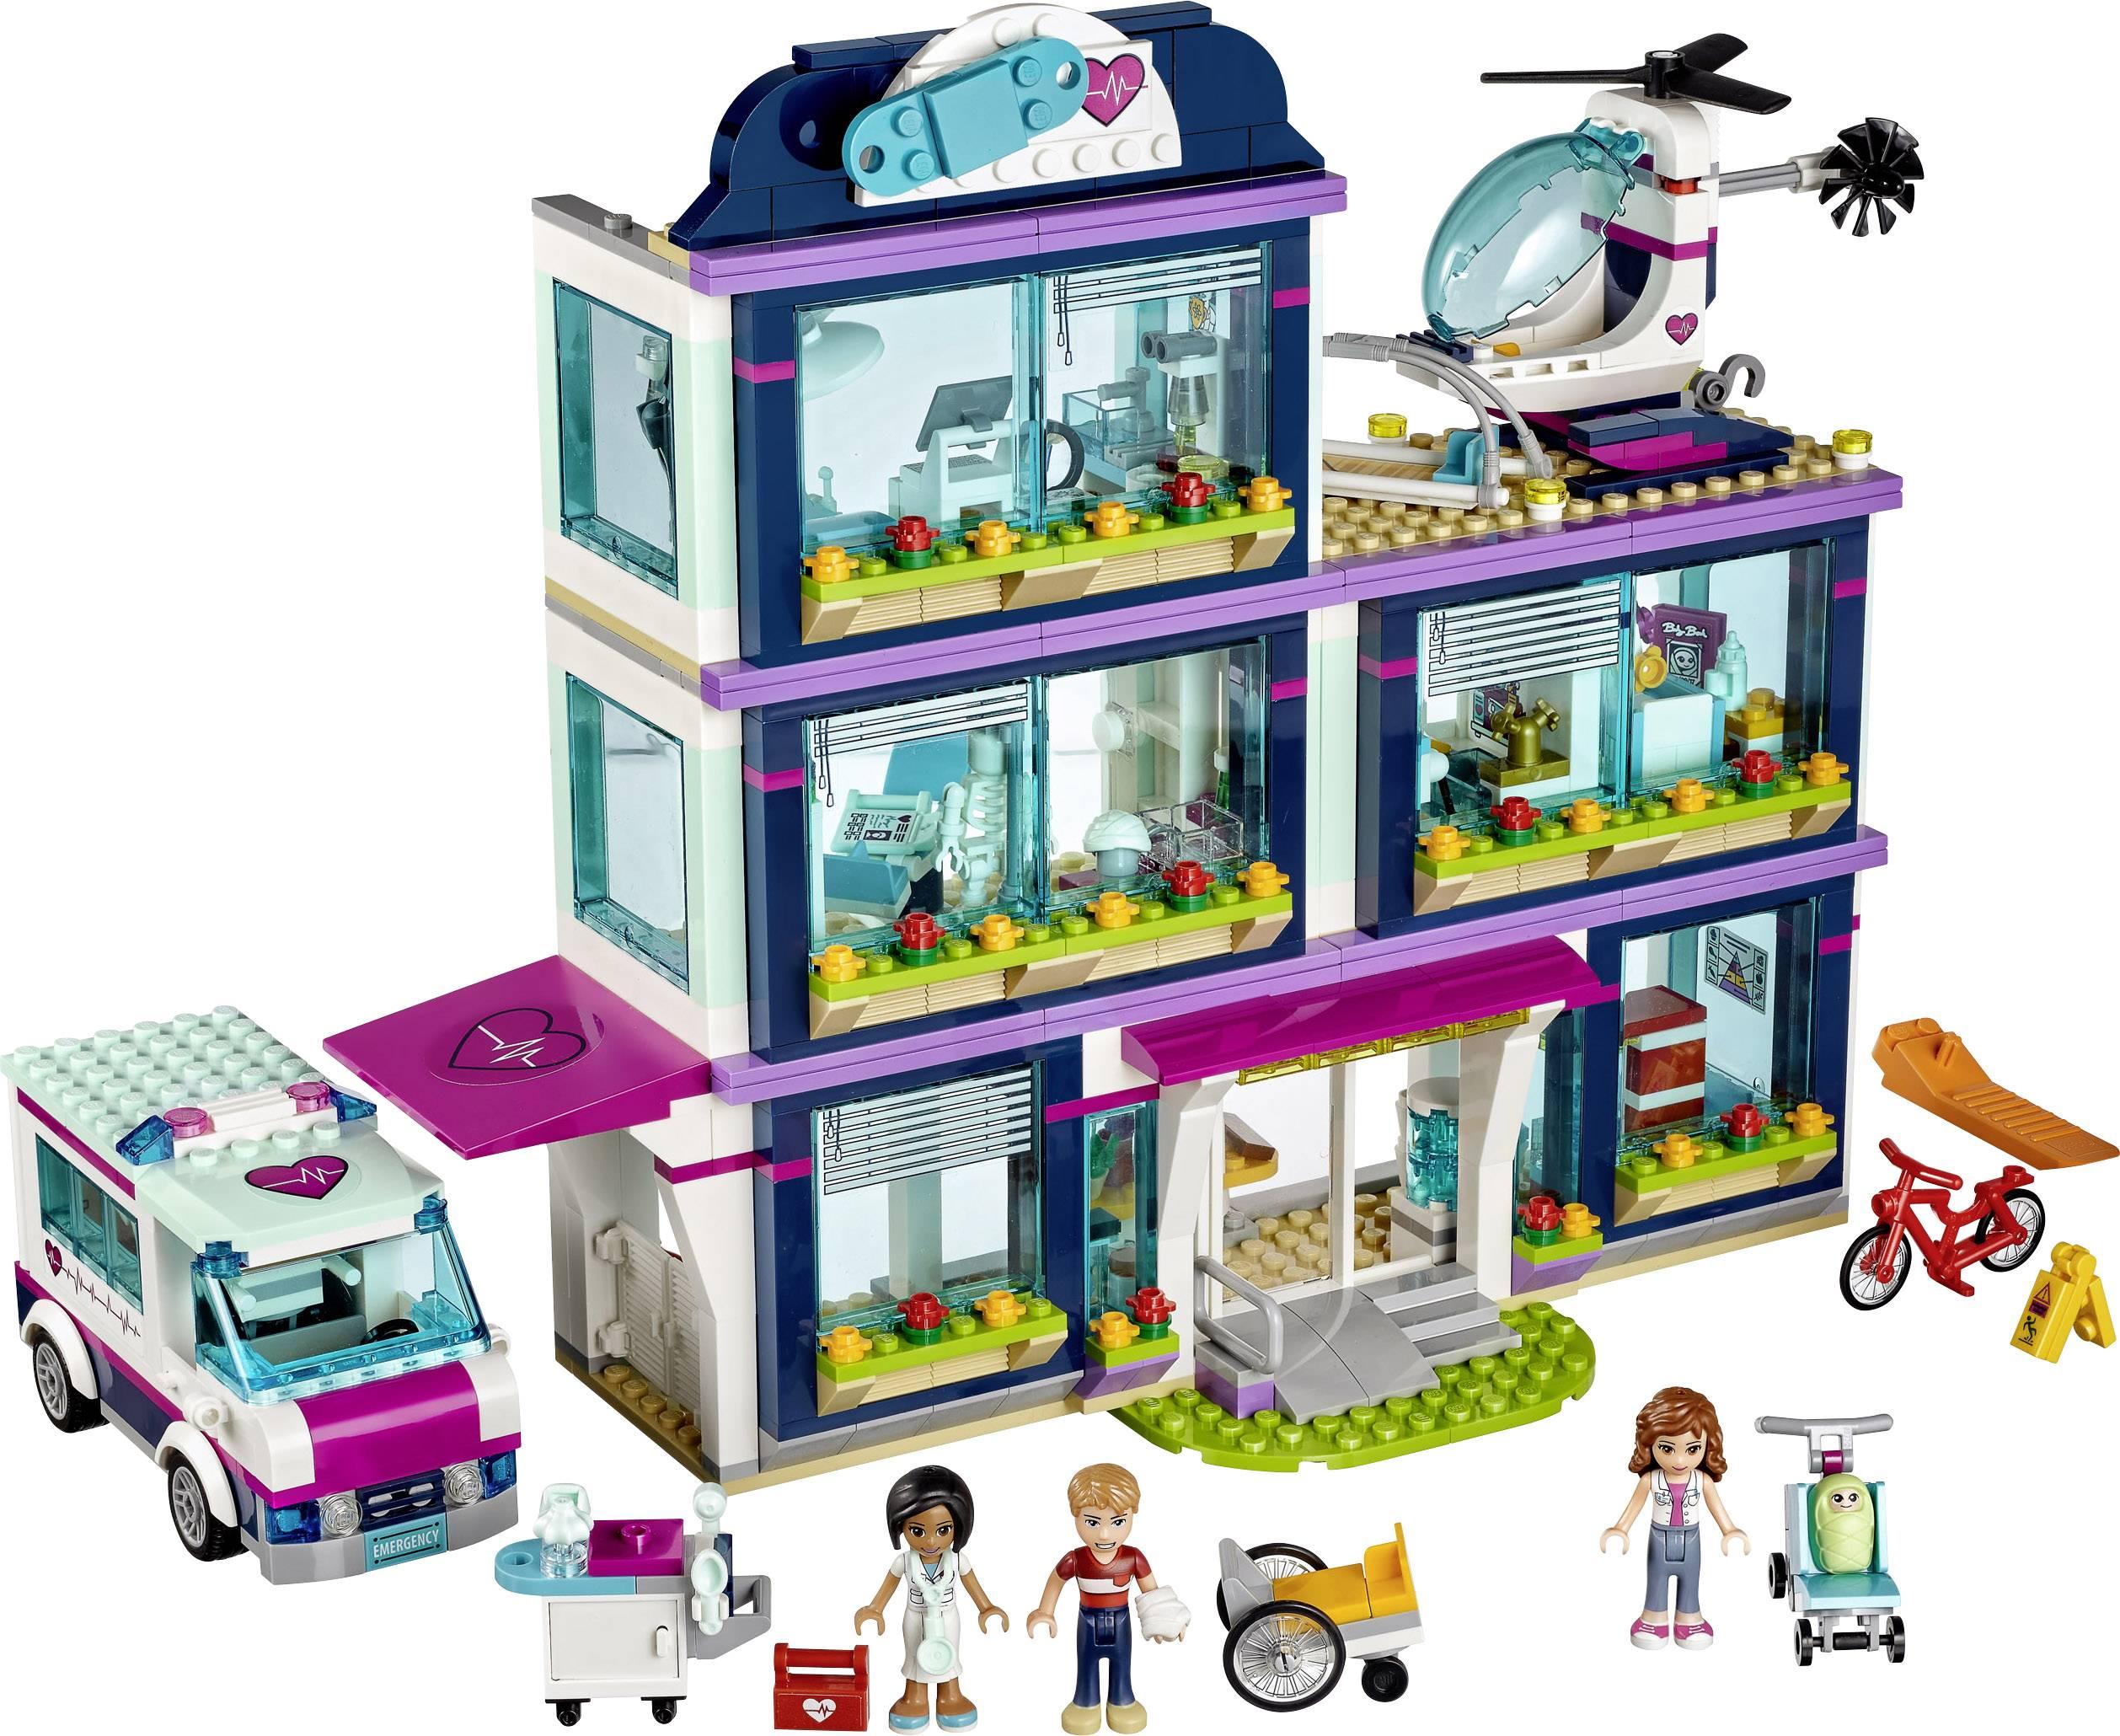 LEGO® FRIENDS 41318 Heartlake ziekenhuis   Conrad.be